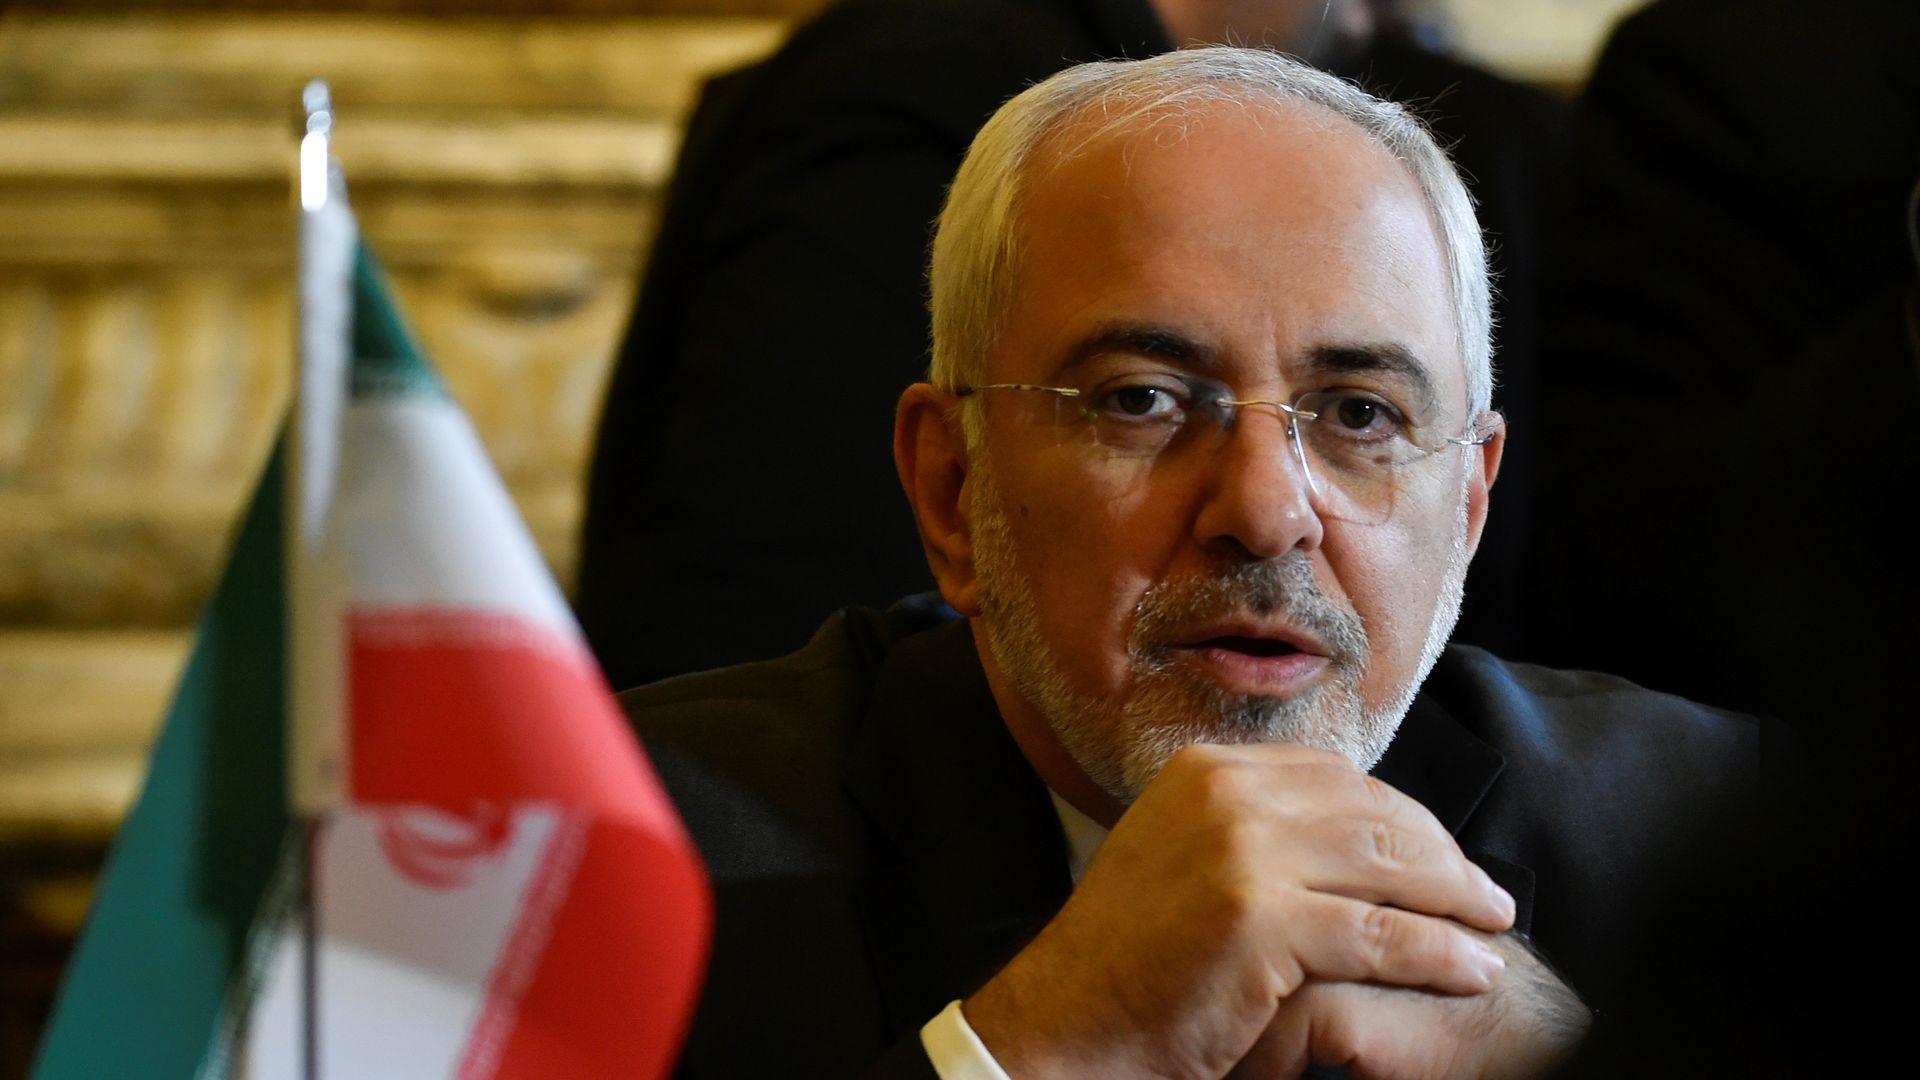 Zarif sits next to an Iranian flag